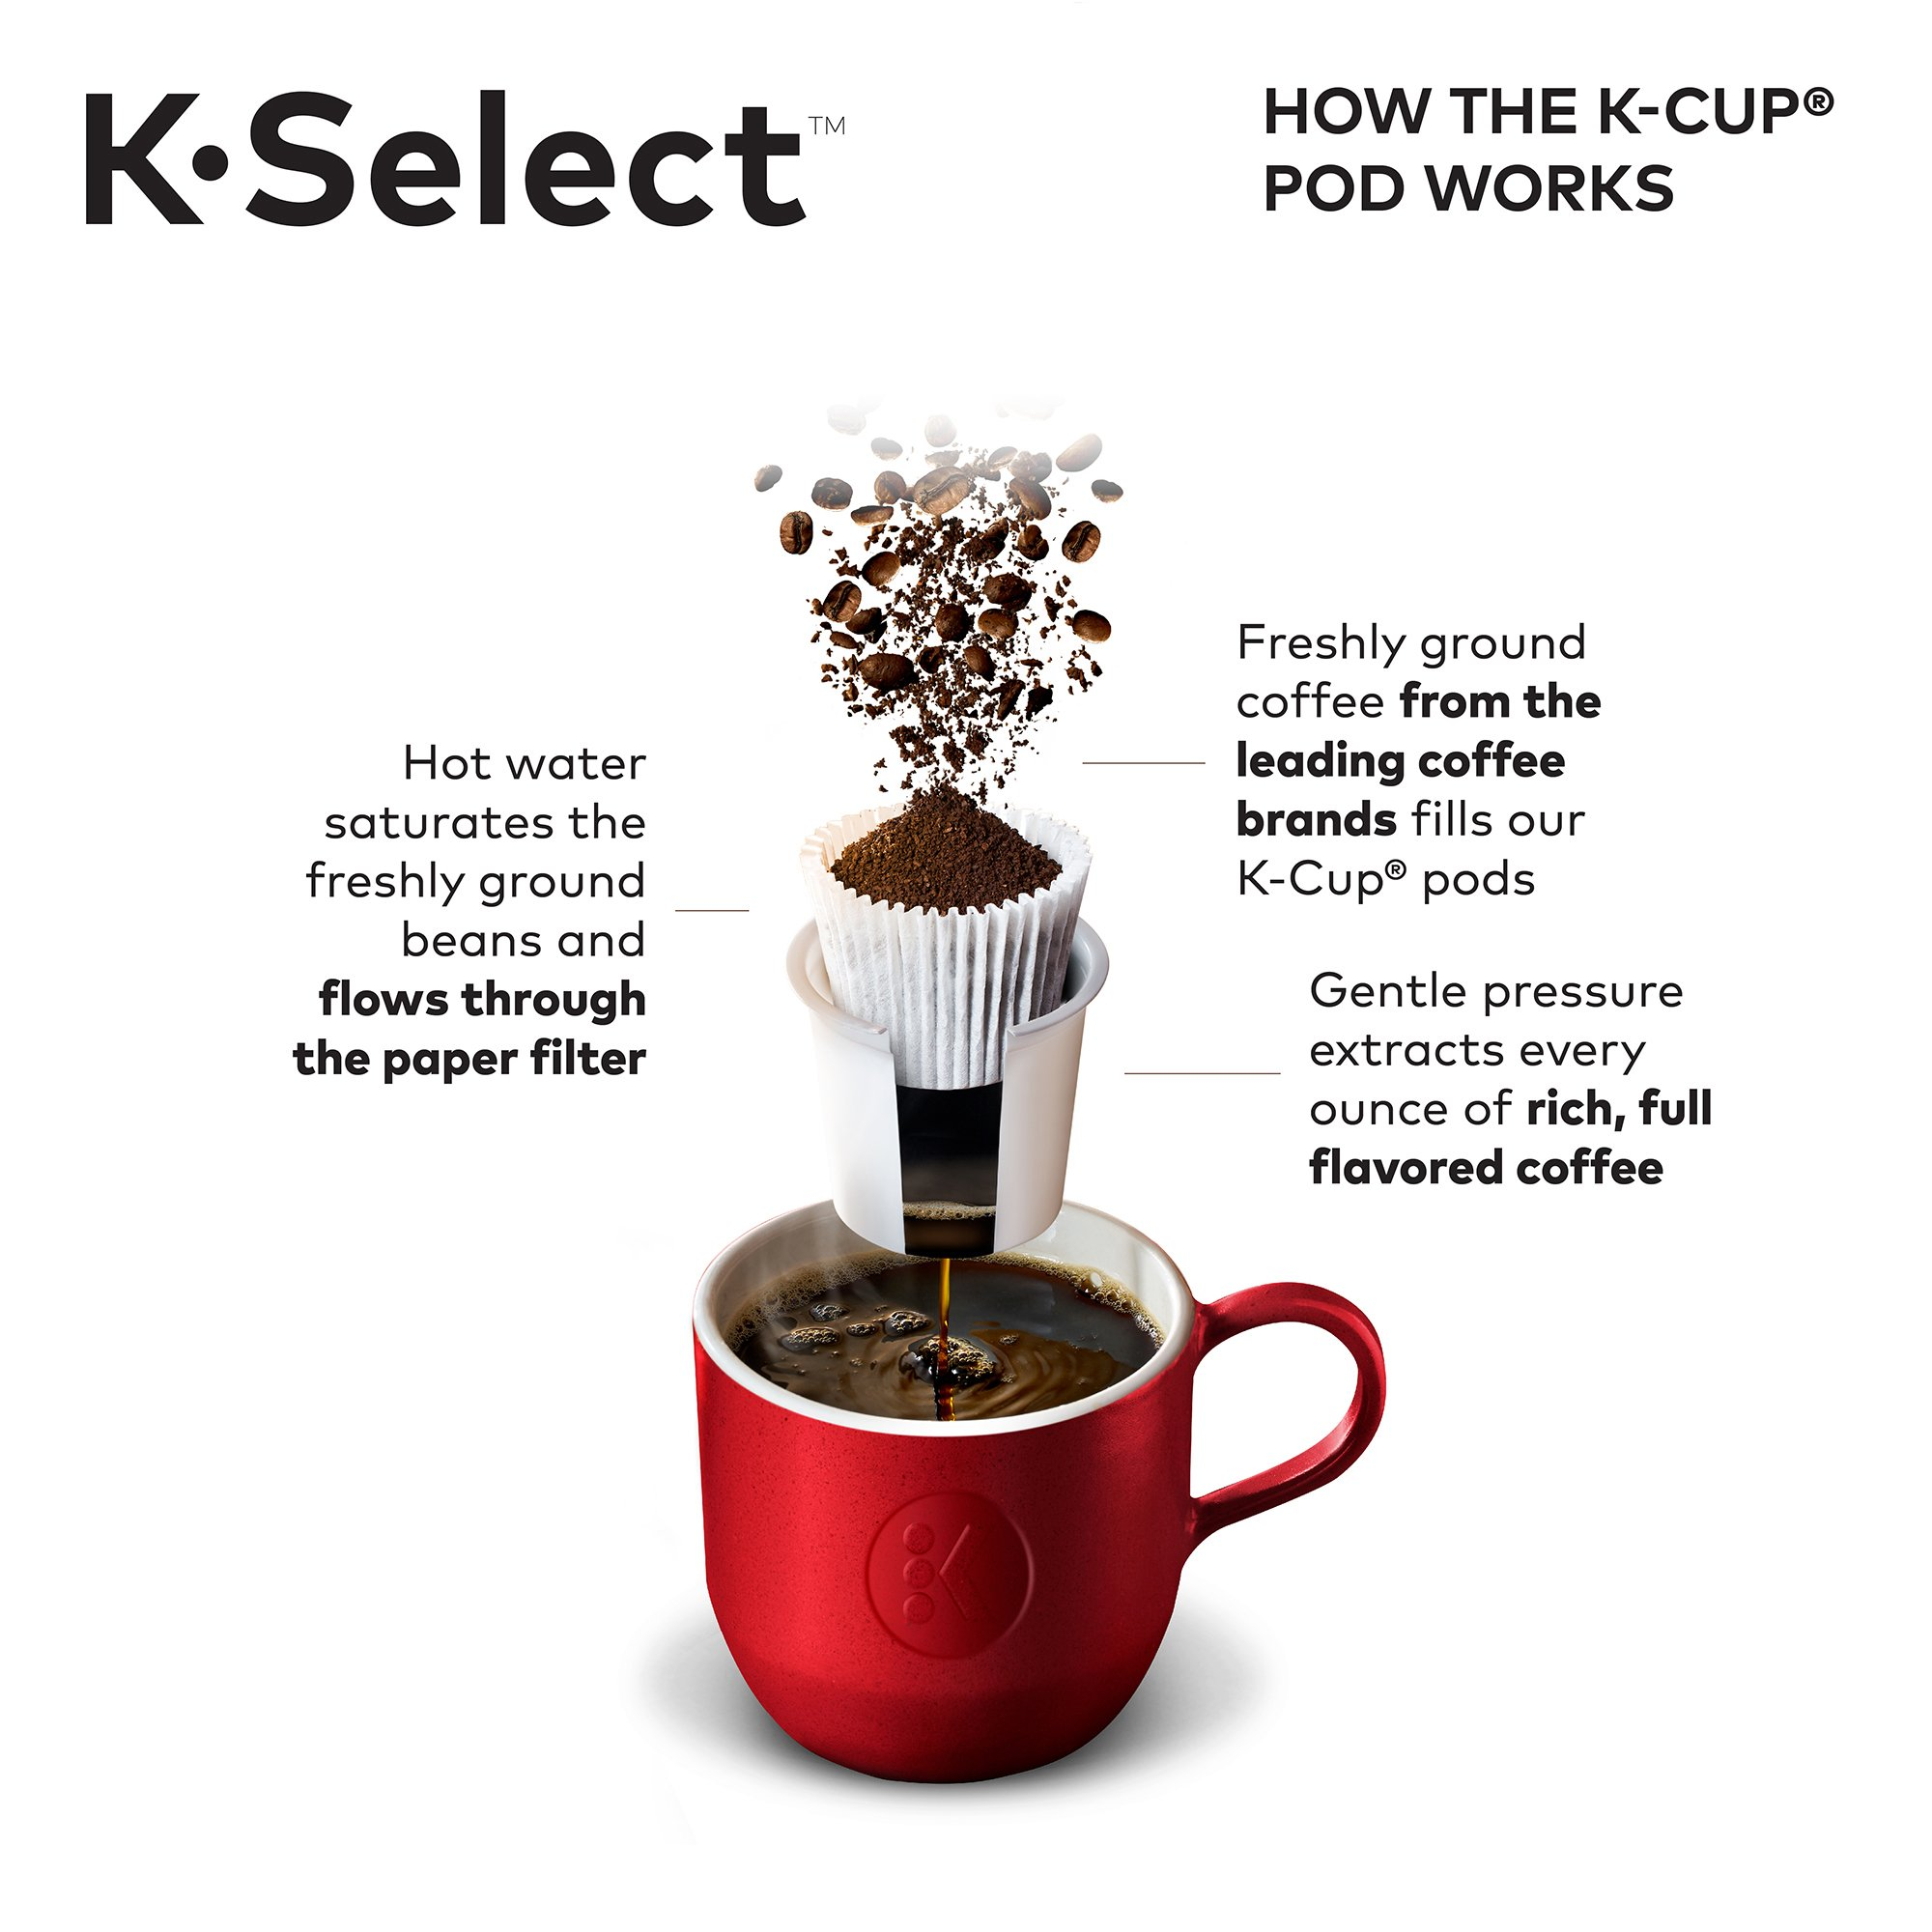 Keurig K-Select Single-Serve K-Cup Pod Coffee Maker with 12oz Brew Size, Strength Control, Matte Black by Keurig (Image #7)